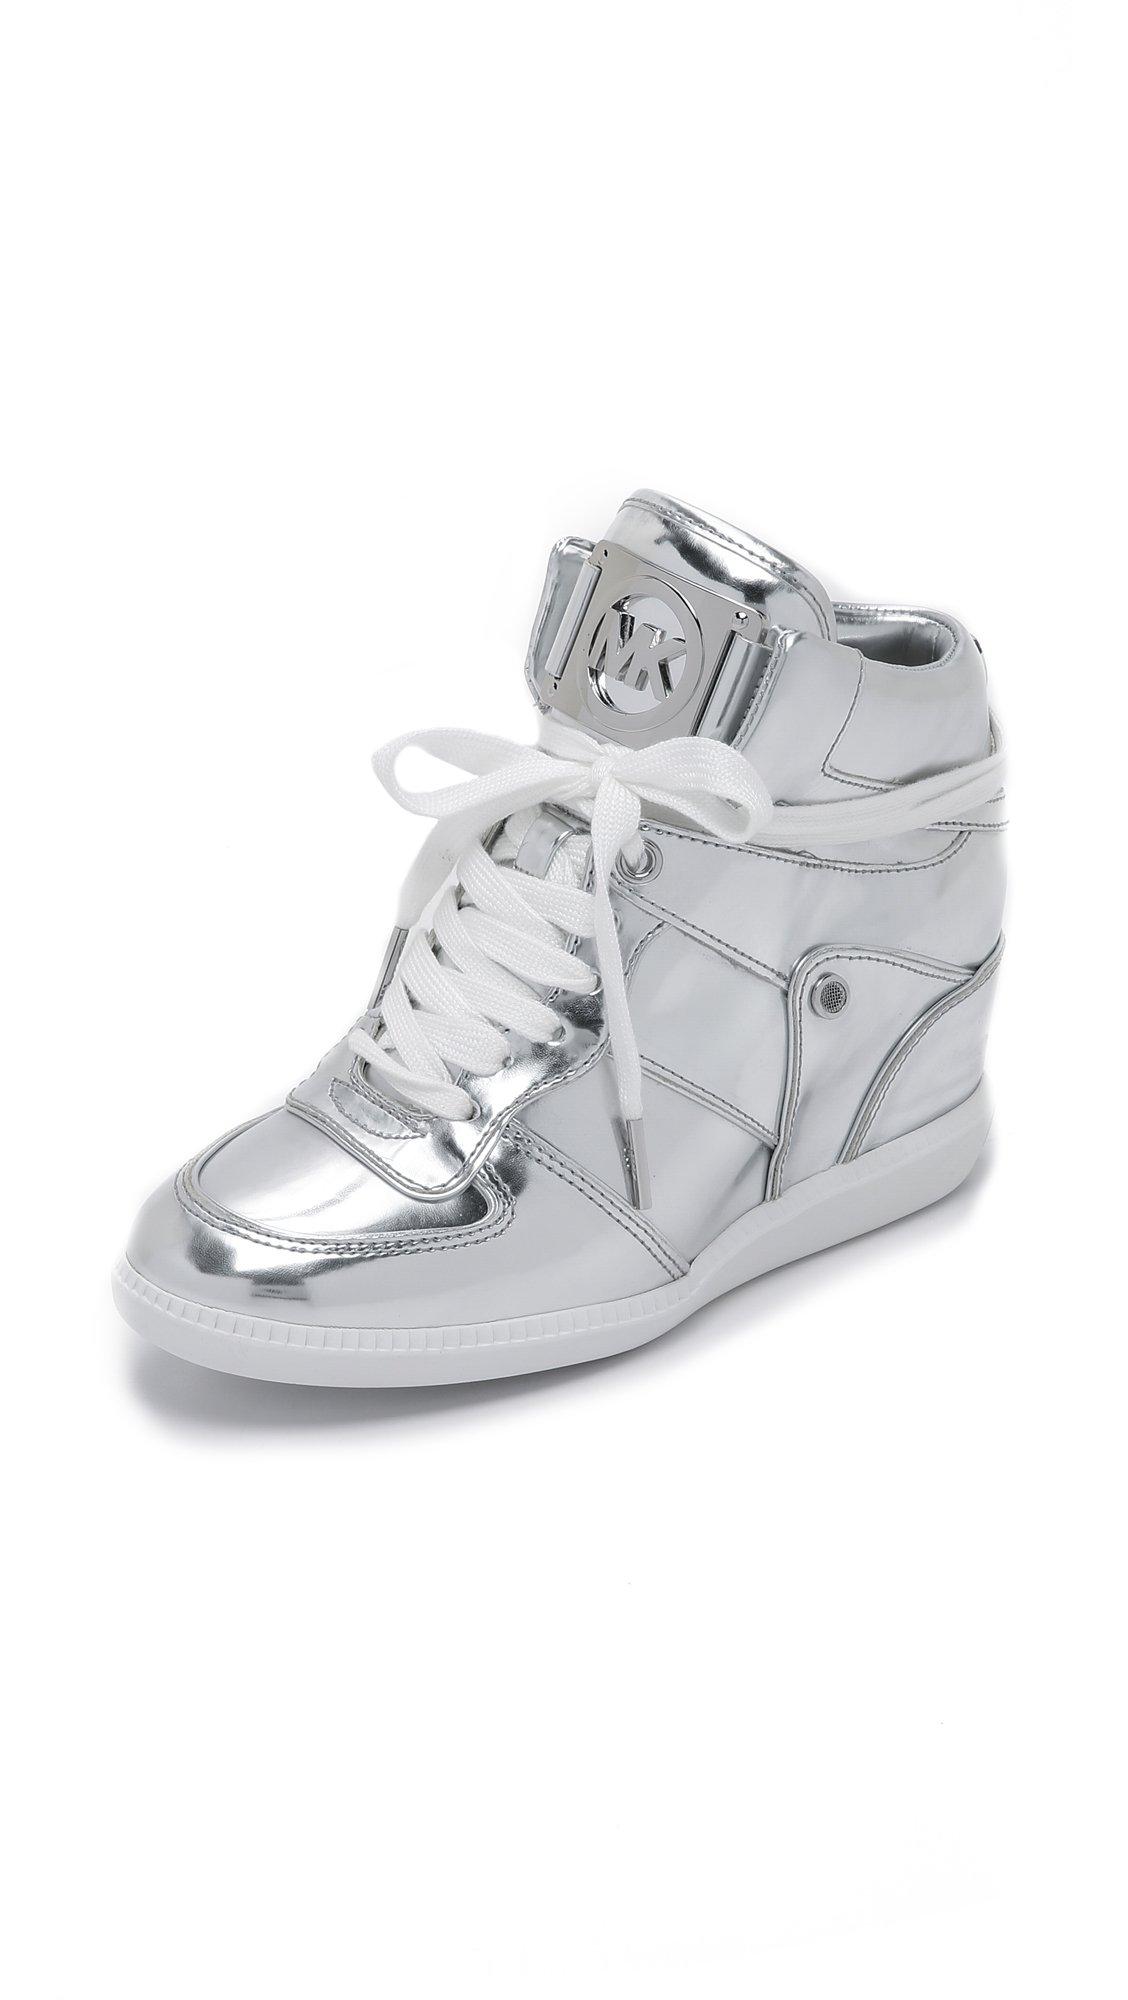 Michael Michael Kors Nikko High Top Sneakers In Metallic